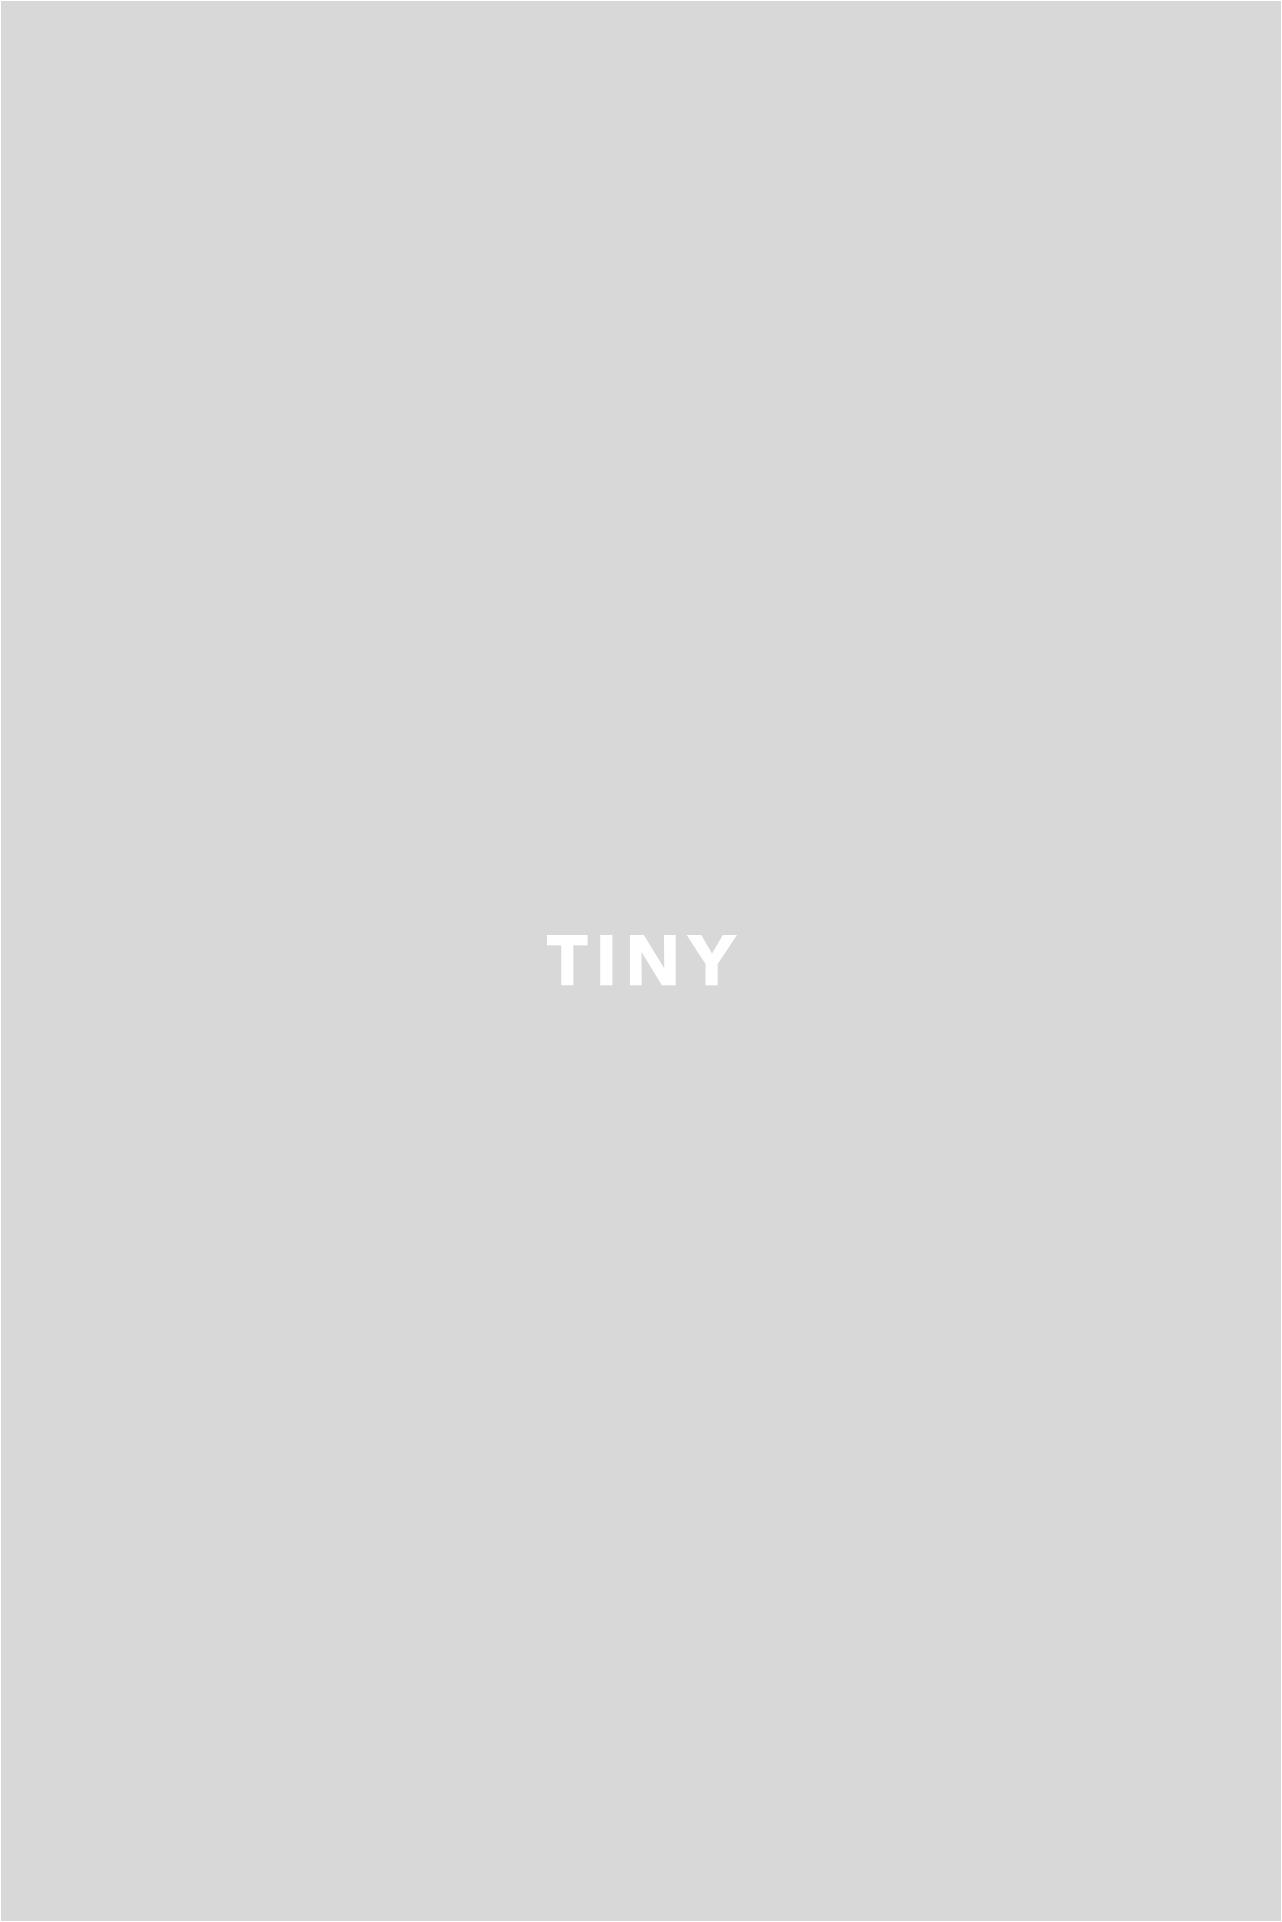 50 Big Natural Wooden Blocks Plantoys